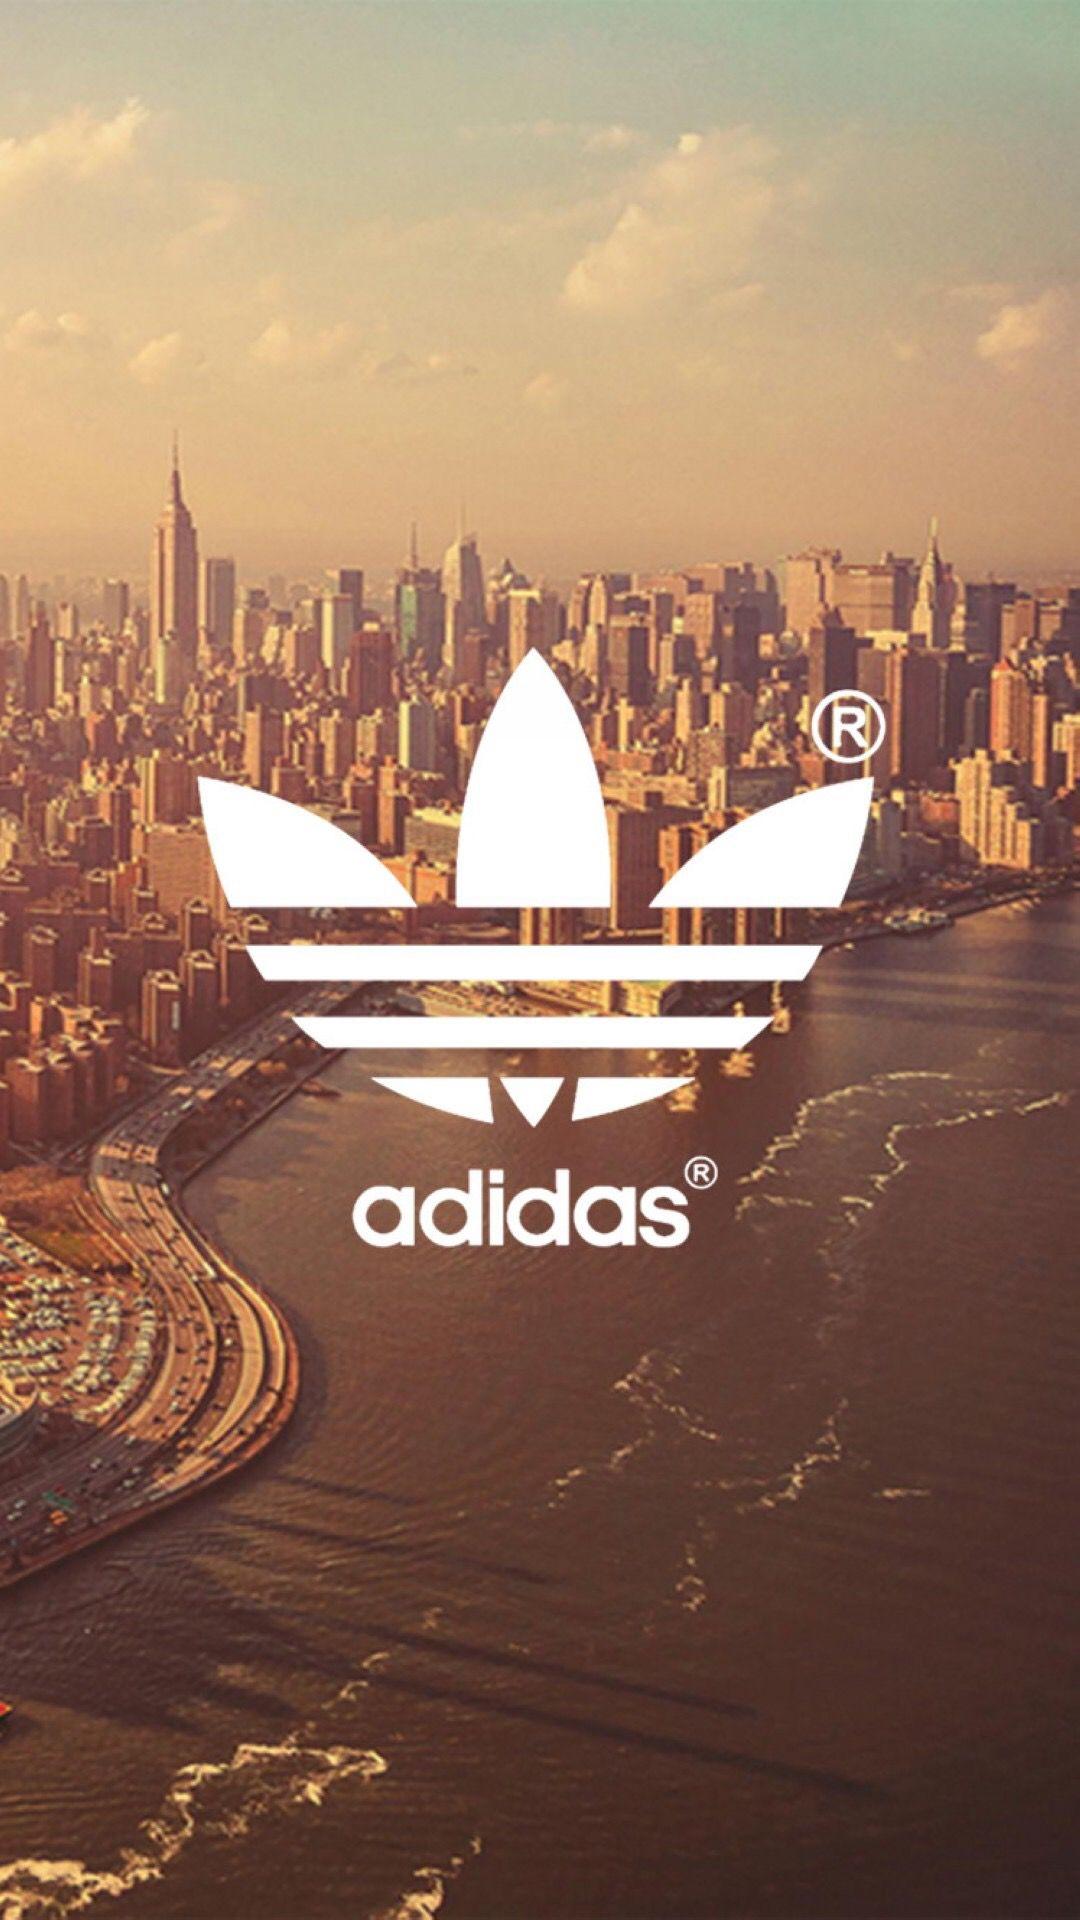 Adidas originals by Adidas Background Katarina. ADIDAS